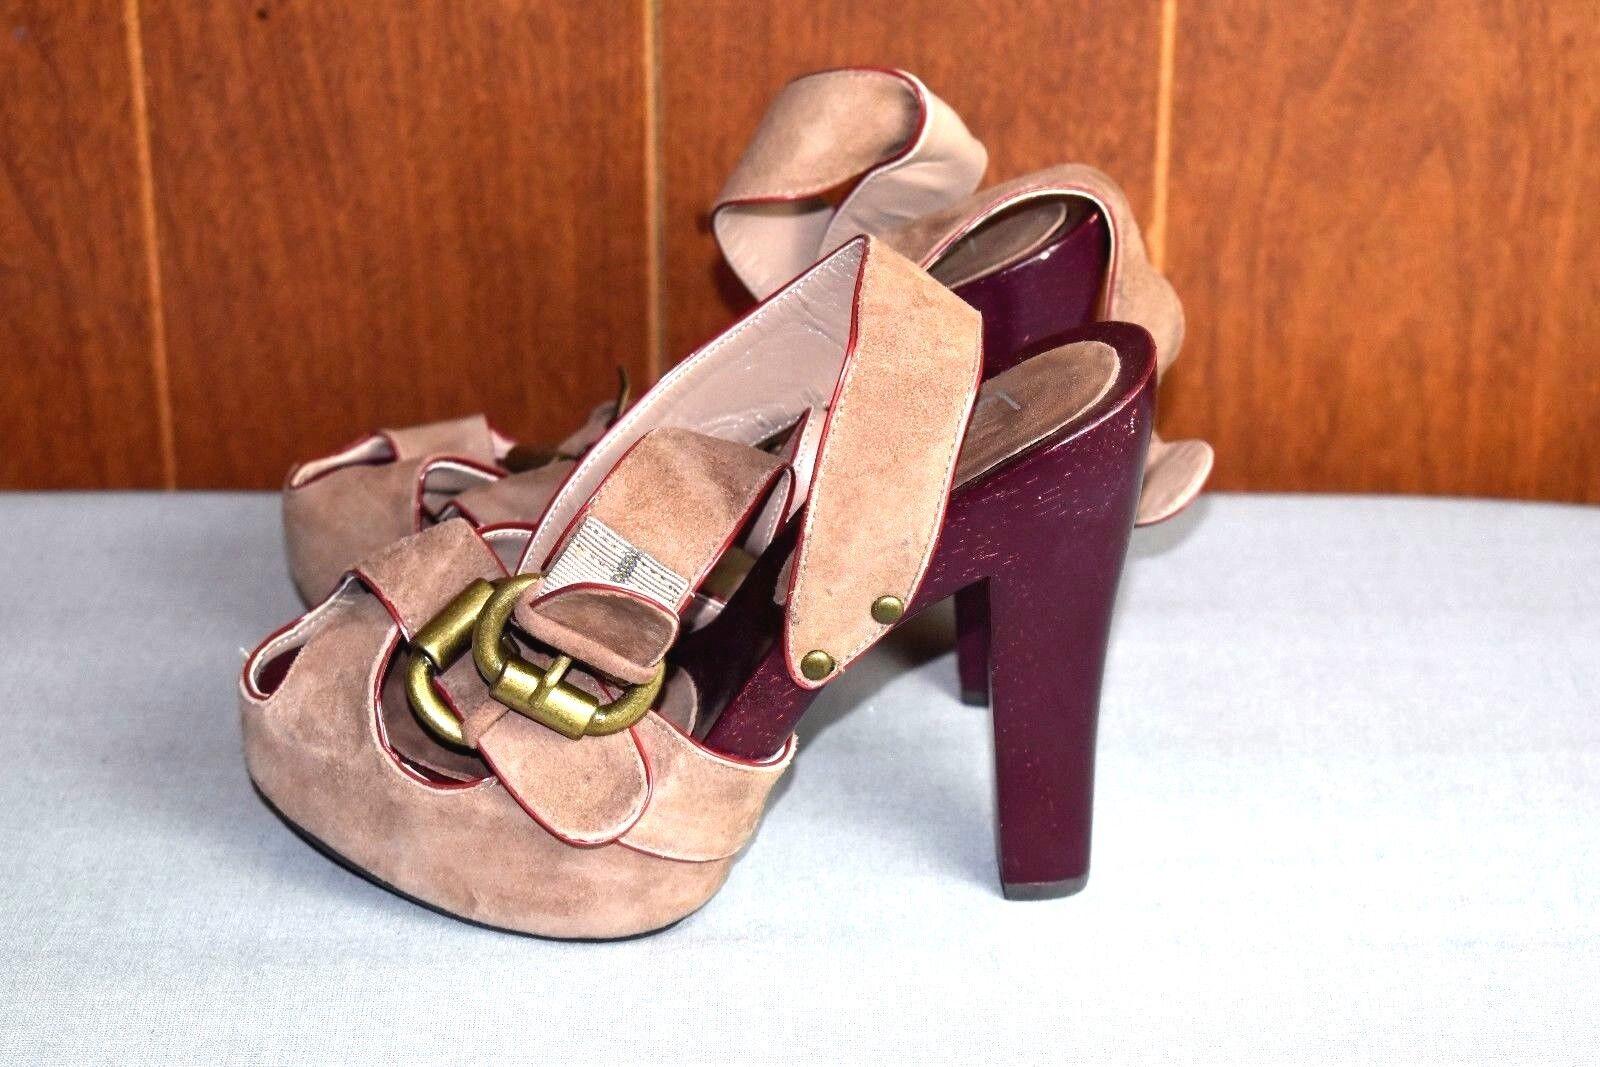 LUICHINY Platform Peep Women's Toe High Heel Shoes Women's Peep 5M Tan Suede Ankle Strap Wood cdb8e9